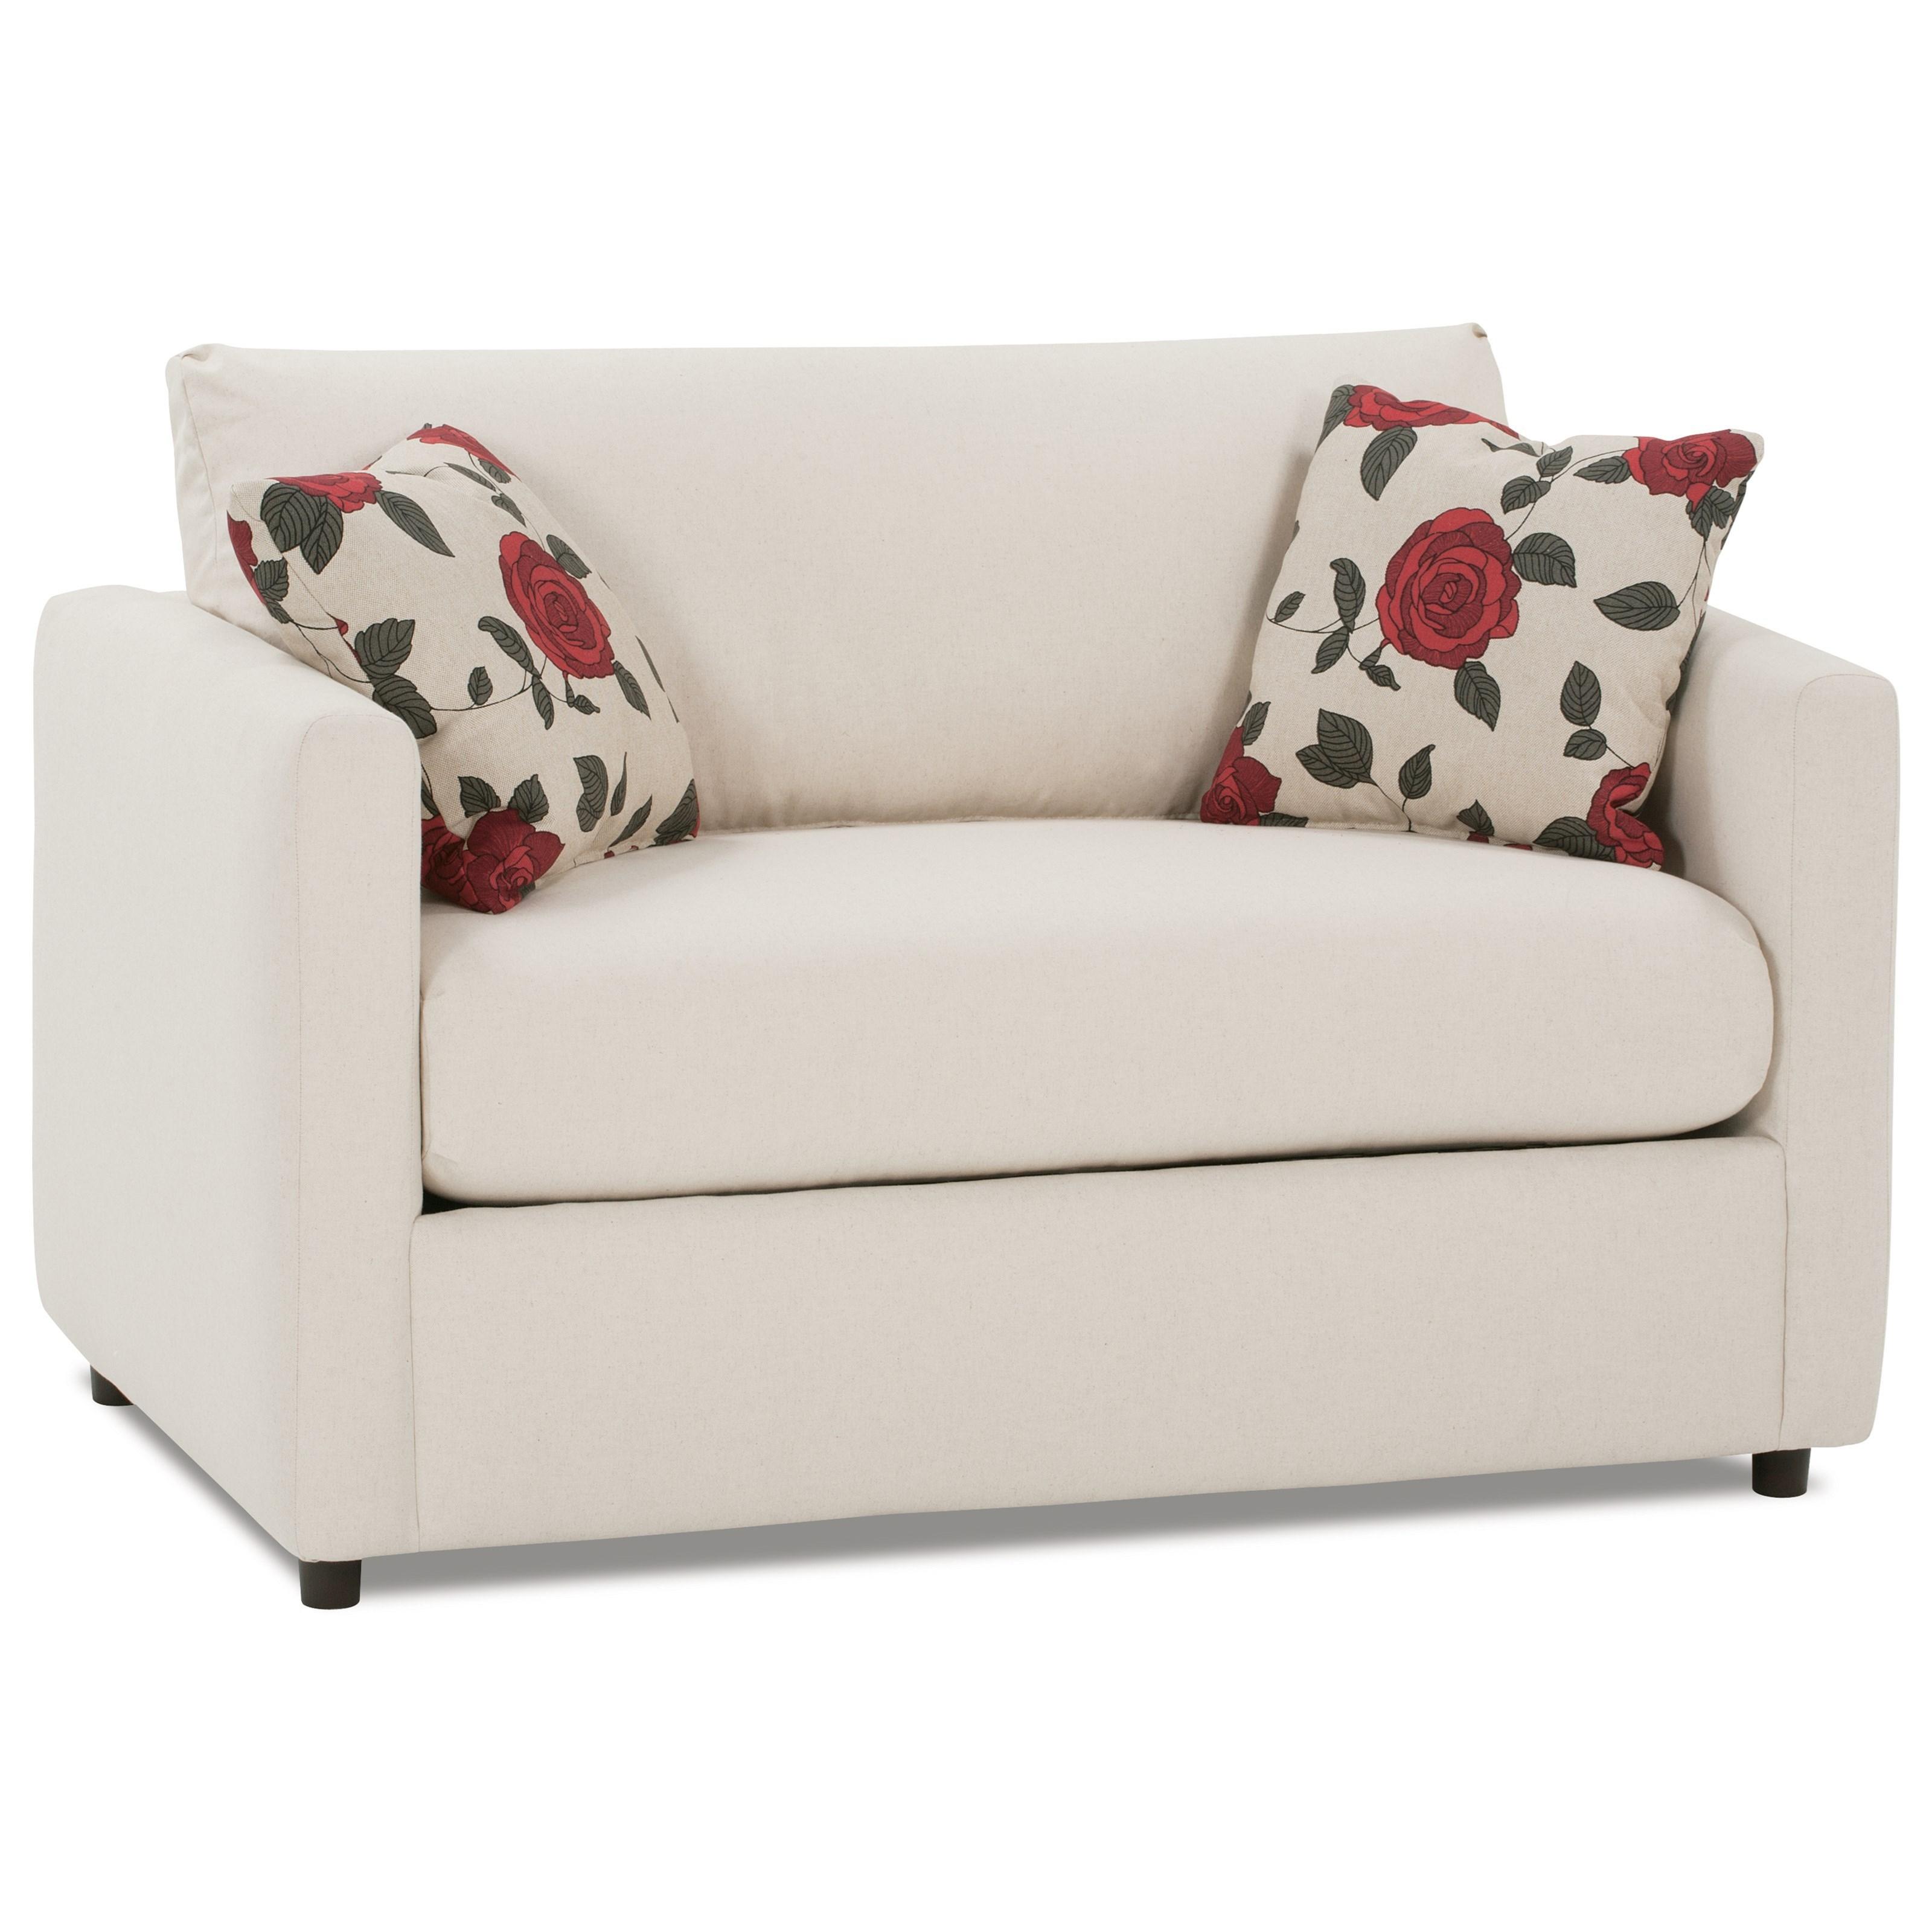 Stockdale Twin Sleeper by Rowe at Baer's Furniture